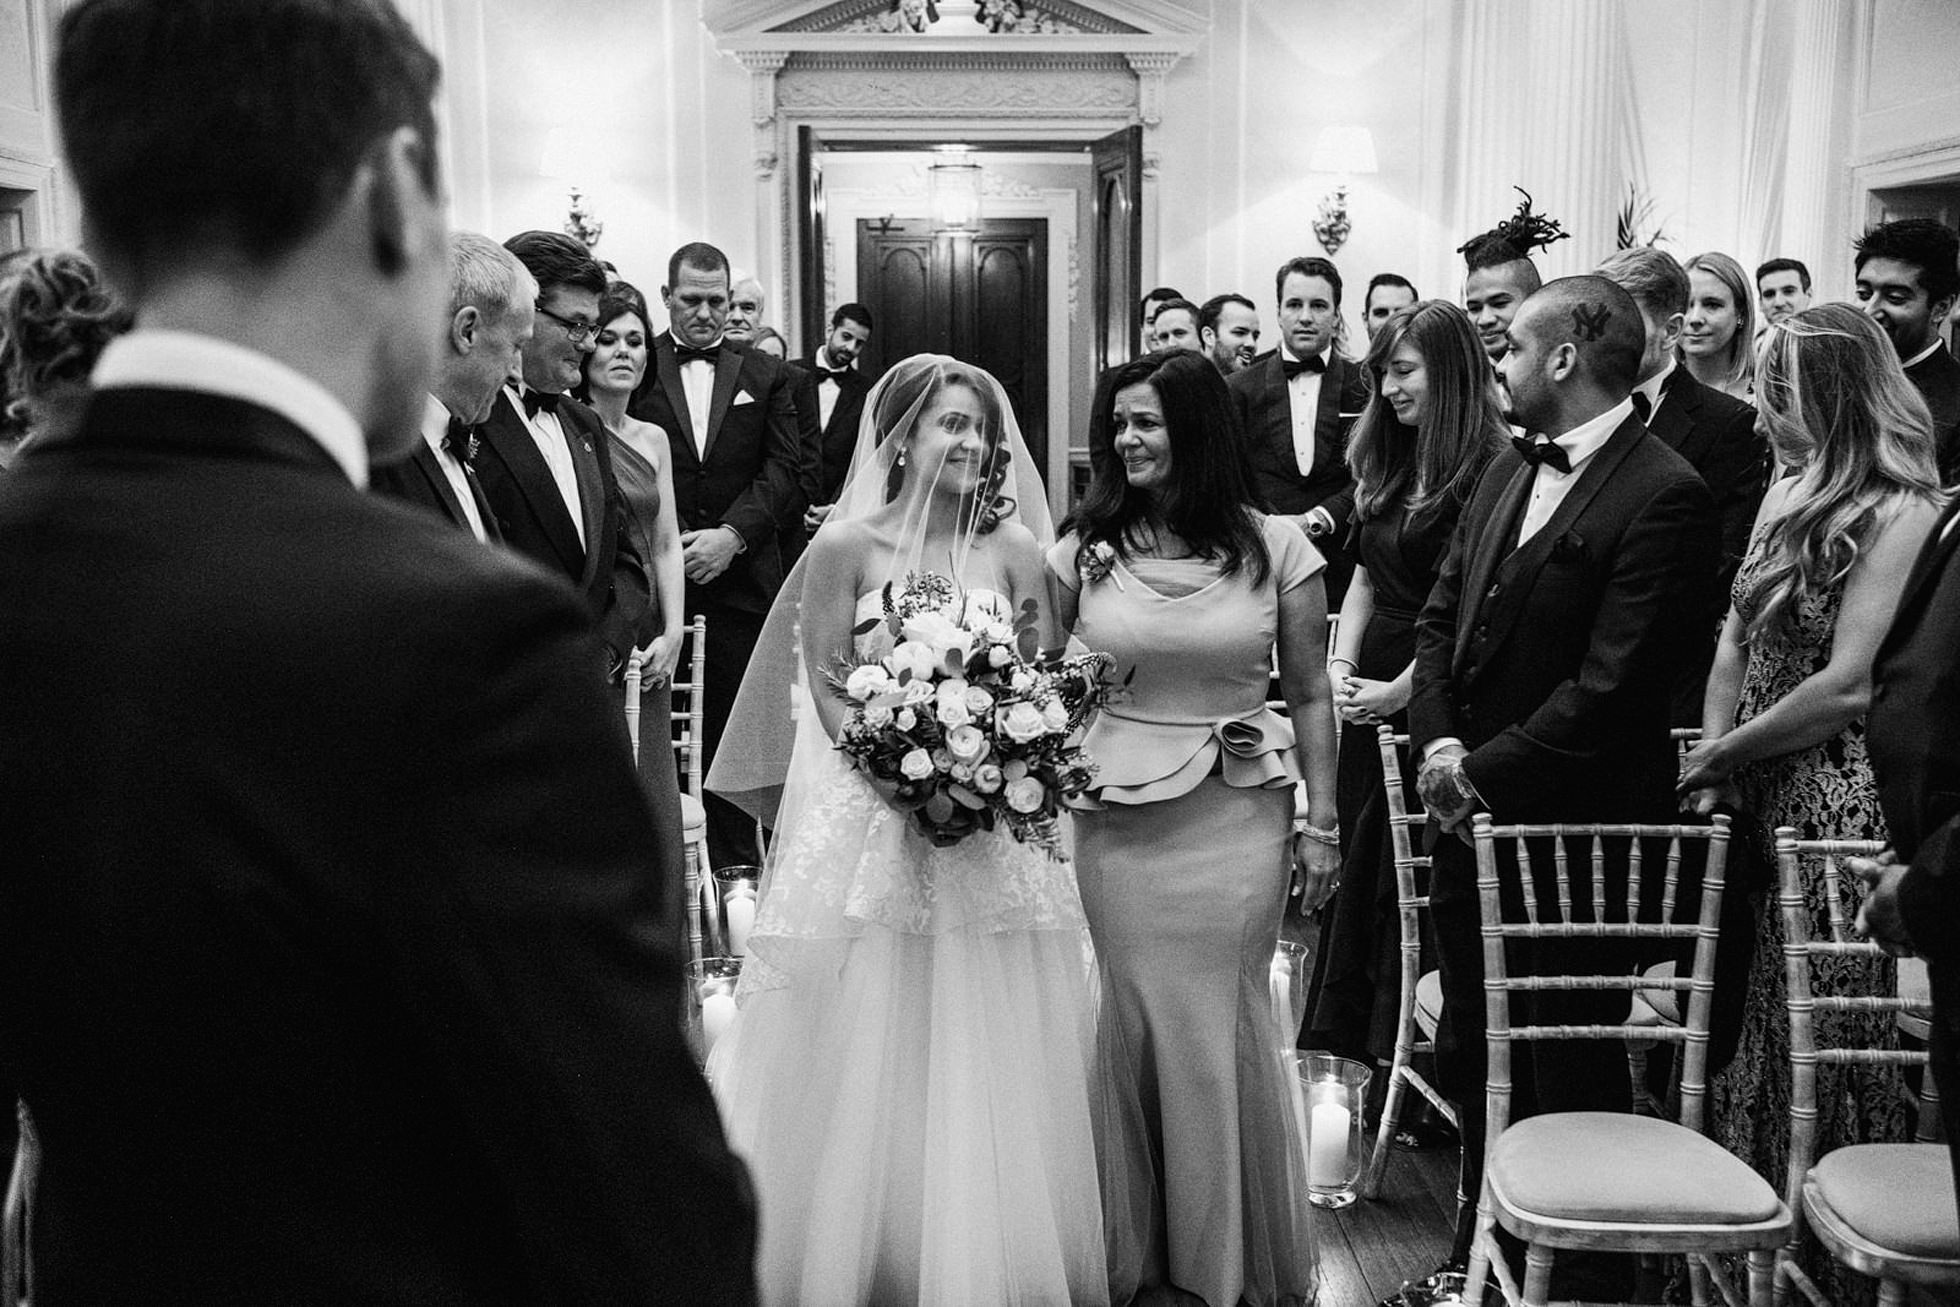 Bridal entrance, Hedsor house wedding photograph